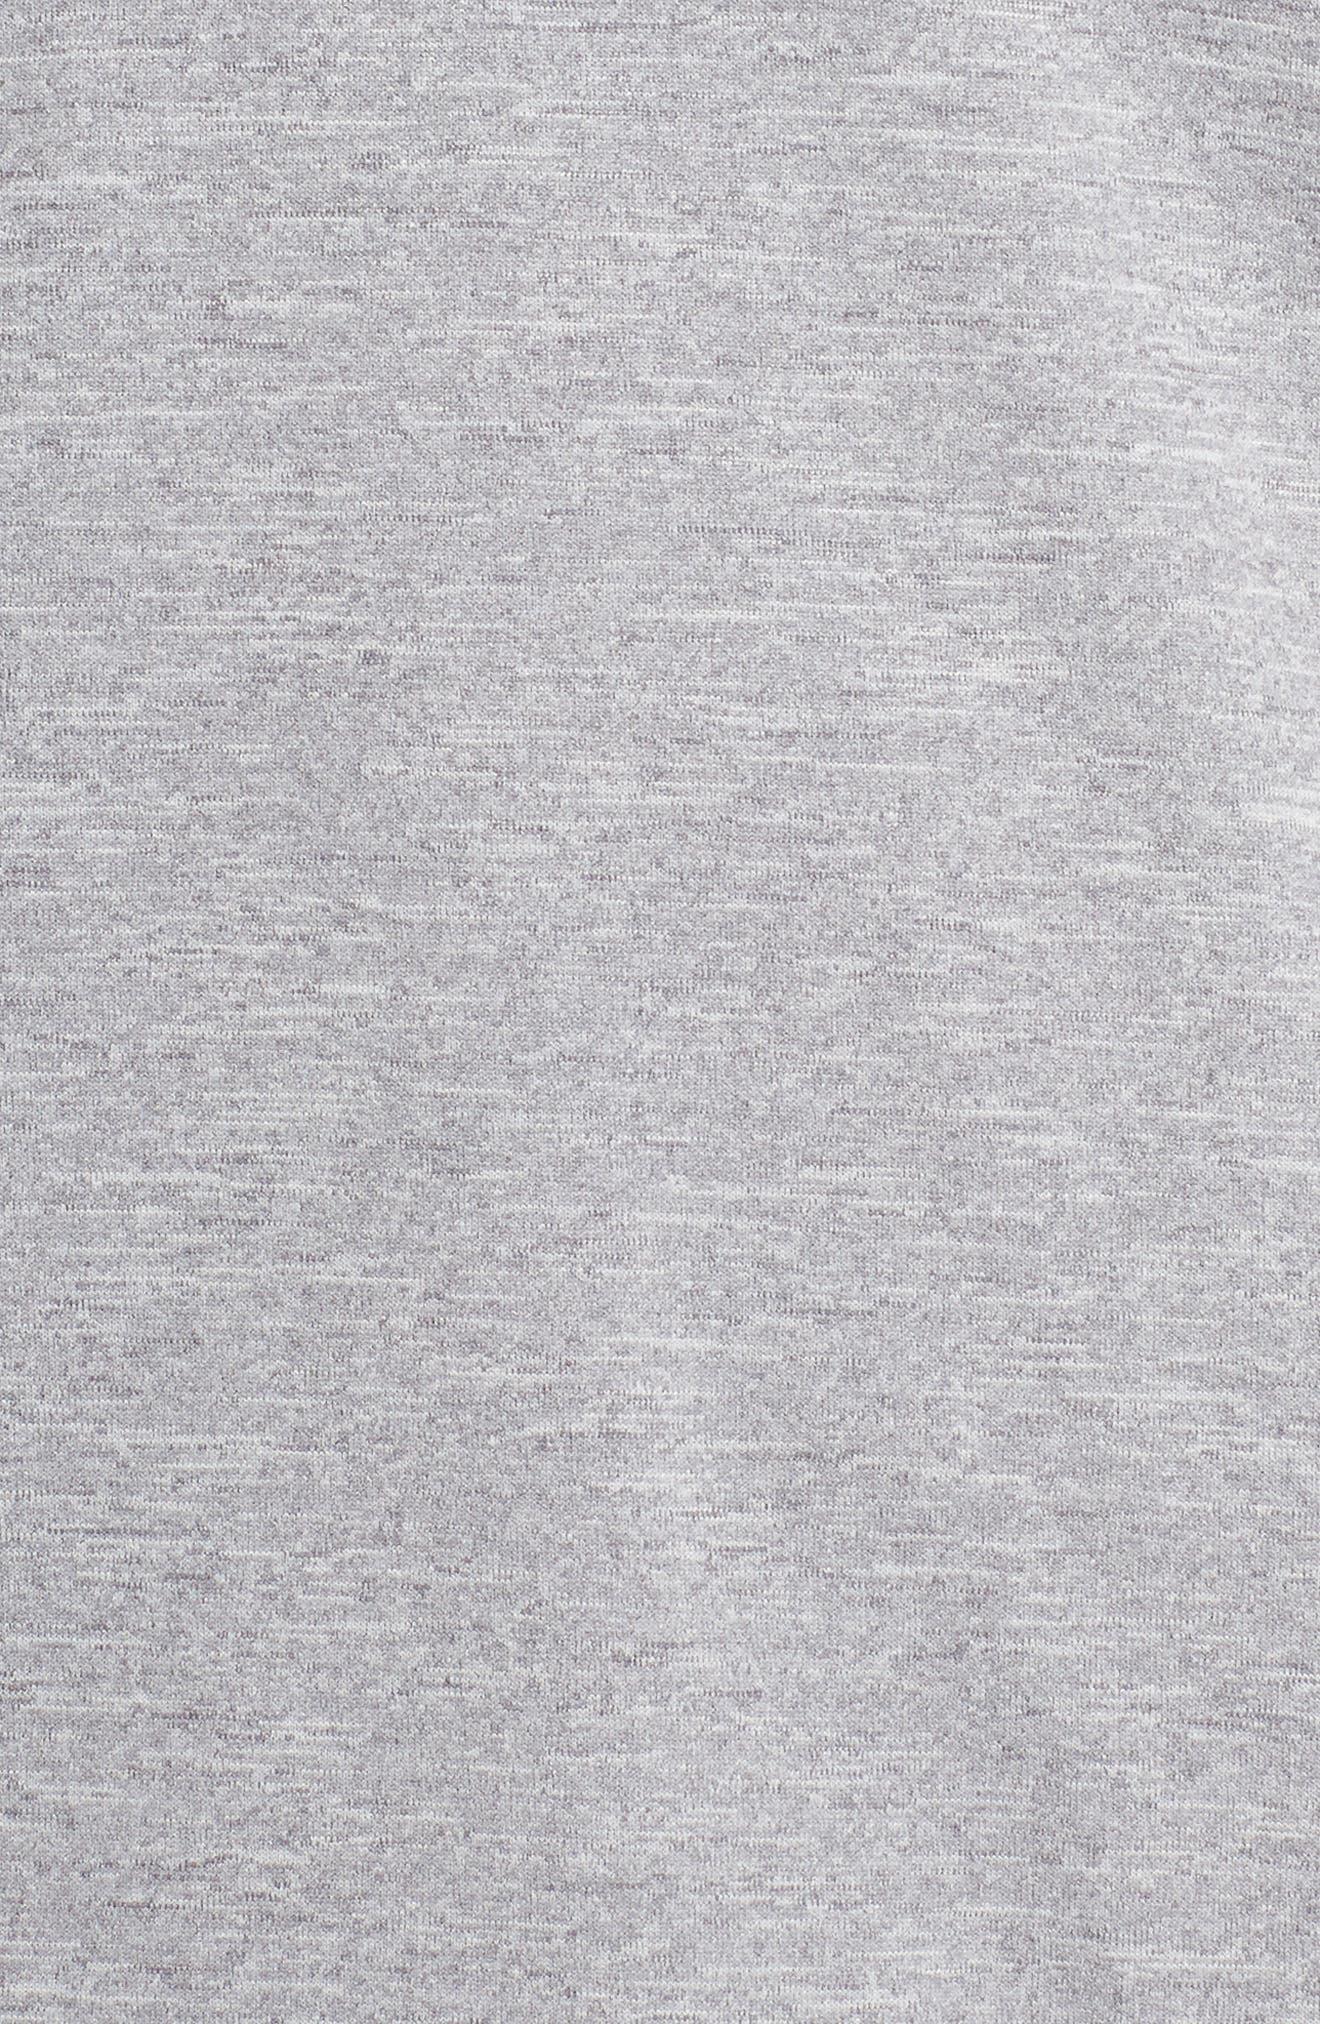 Therma Sphere Element Running Shirt,                             Alternate thumbnail 6, color,                             GUNSMOKE/ HEATHER